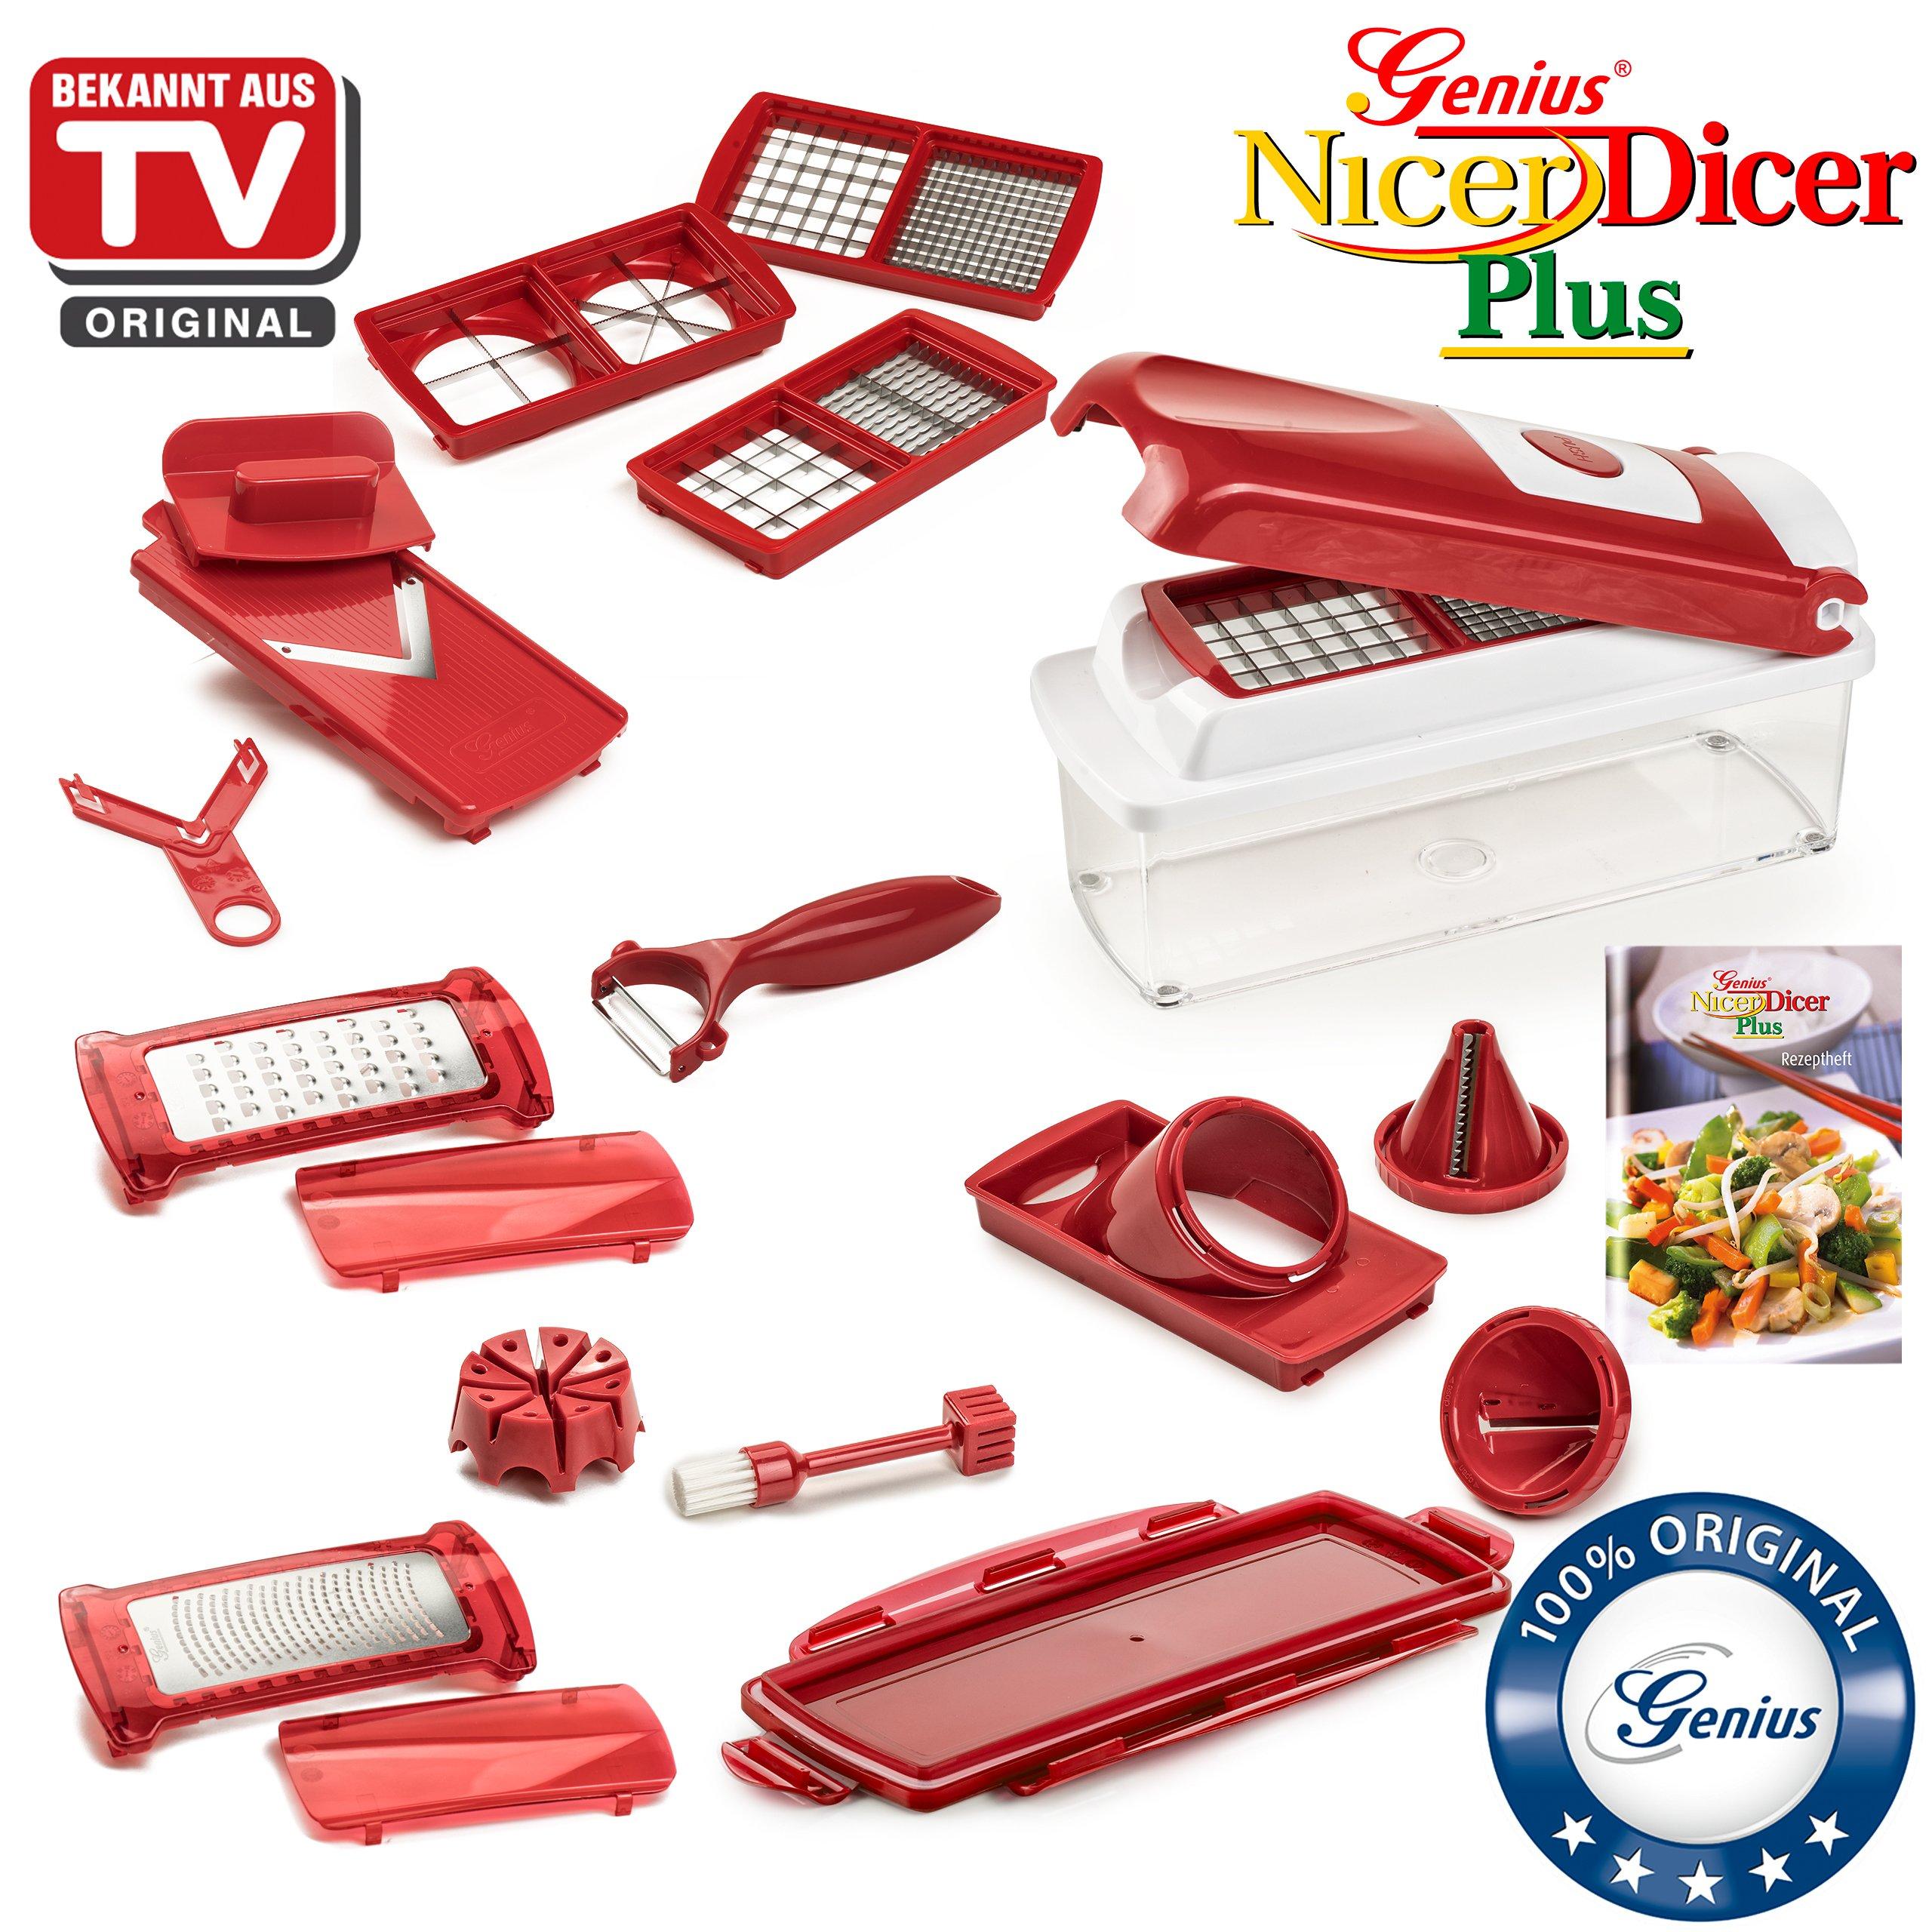 Nicer Dicer Plus by Genius 18 pieces | Fruit vegetable slicer | Food-Chopper PRO| Mandoline | Potato, Tomato, Onion | Kitchen-Cutter Dicer | Stainless Steel |Spiralizer | Spiral Slicer | As seen on TV